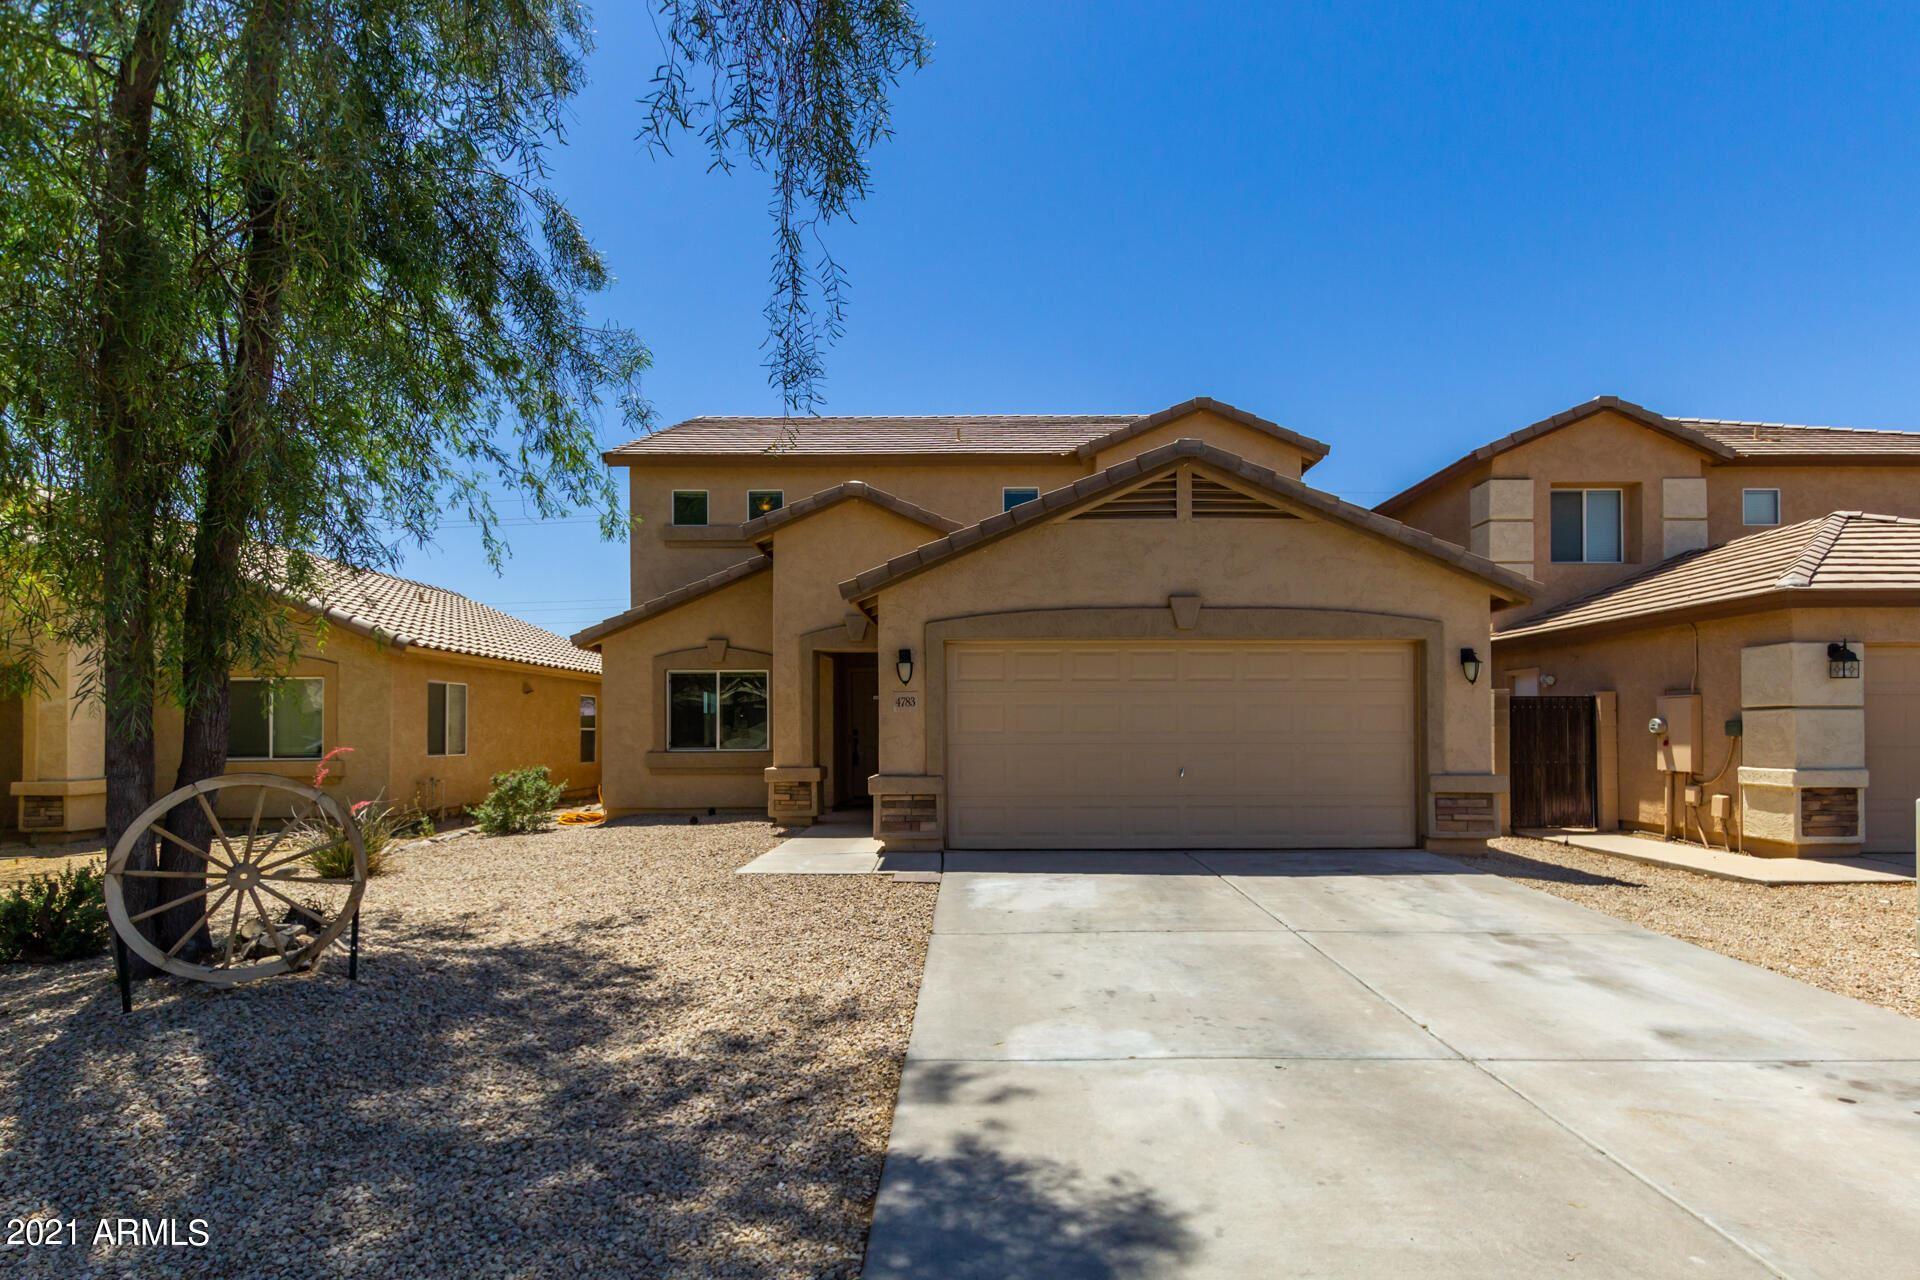 Photo of 4783 E SILVERBELL Road, San Tan Valley, AZ 85143 (MLS # 6231008)